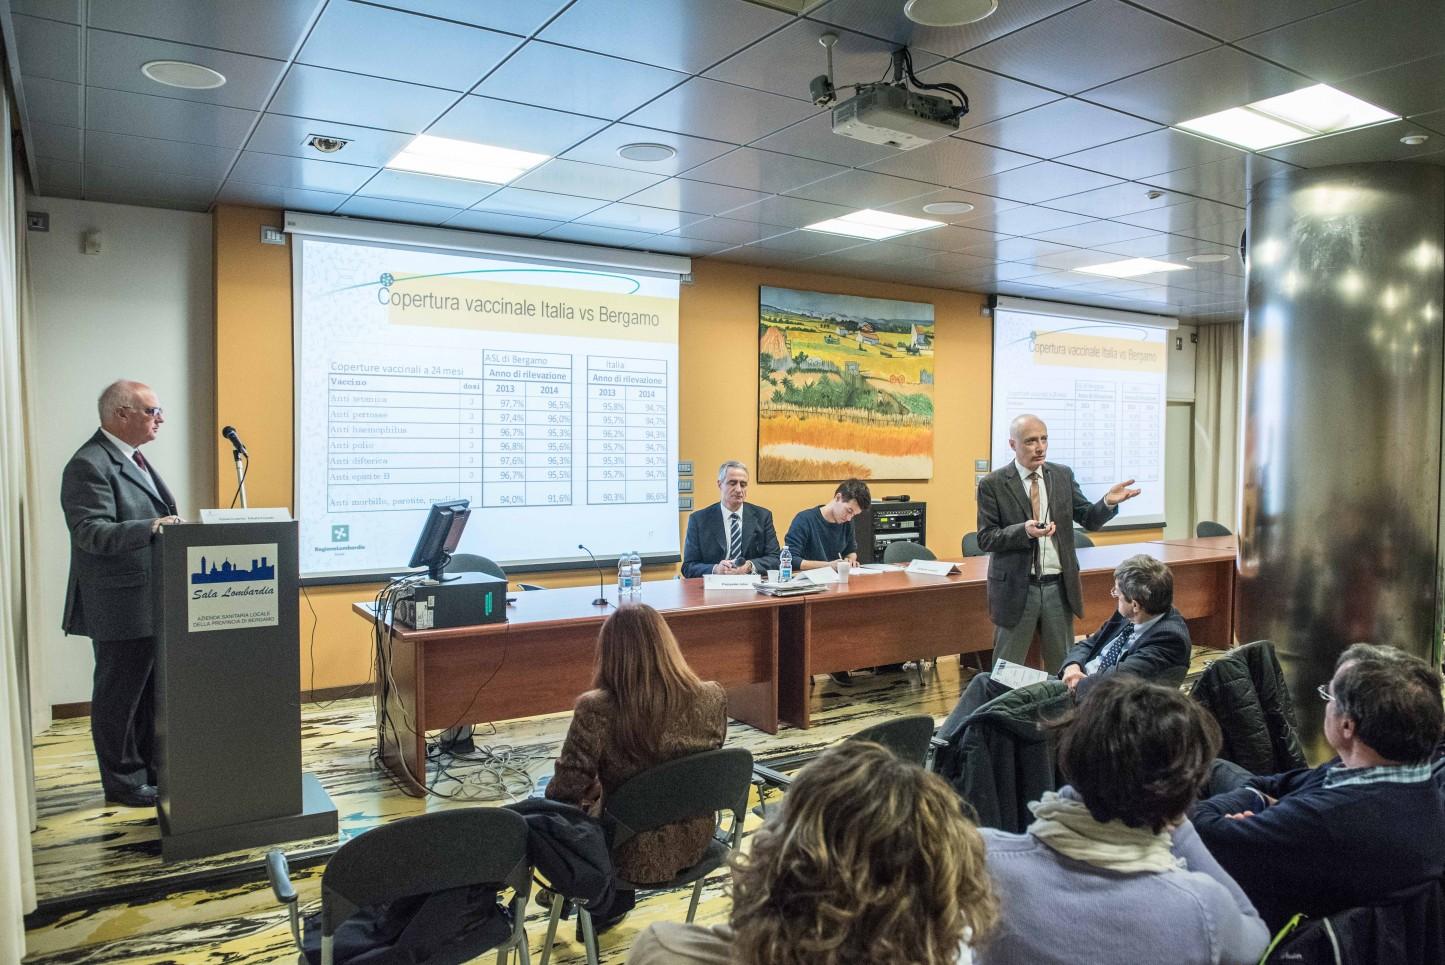 21.11.2015 - Bergamo, Convegno Vaccinazioni in età pediatrica - Discussione